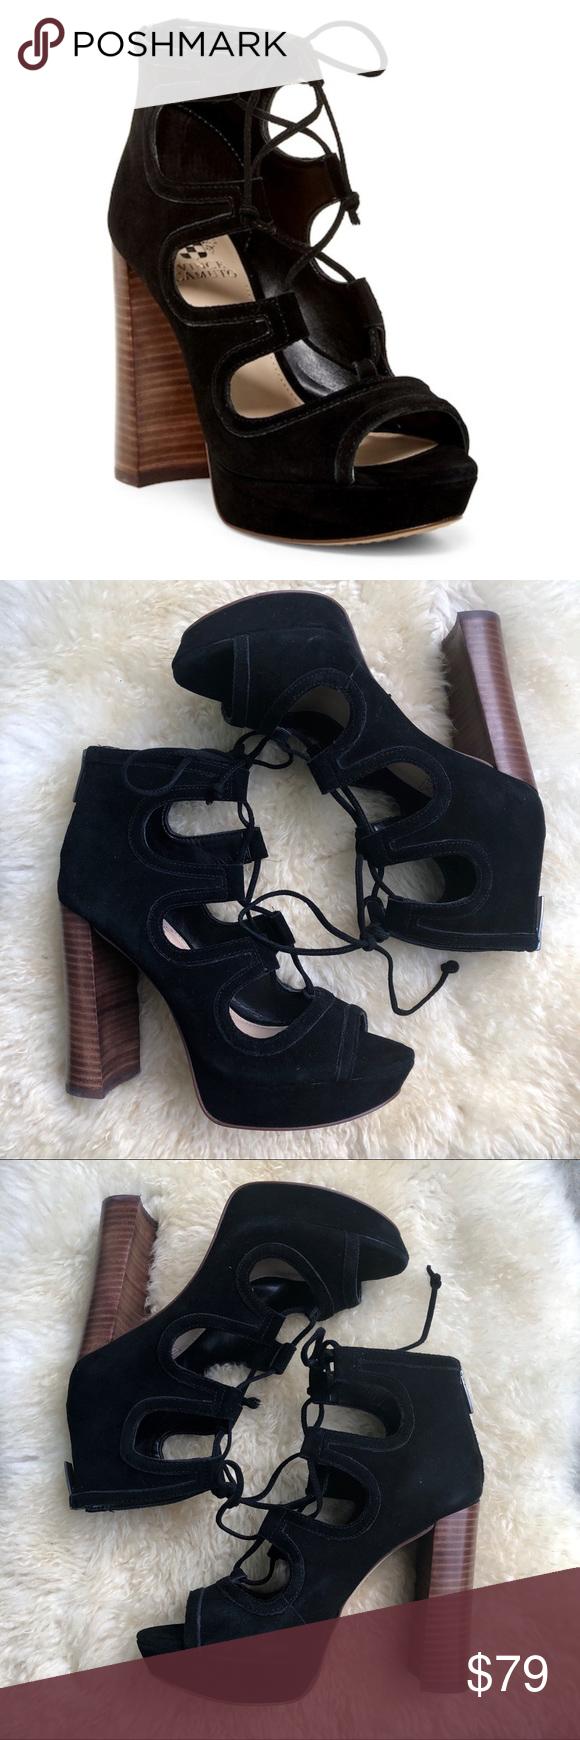 Vince Camuto Kamaye Ghillie Platform Sandals Black Flirty Ghillie Lacing Lace Up Corsets Up The Front Of This Black Sandals Platform Sandals Vince Camuto Shoes